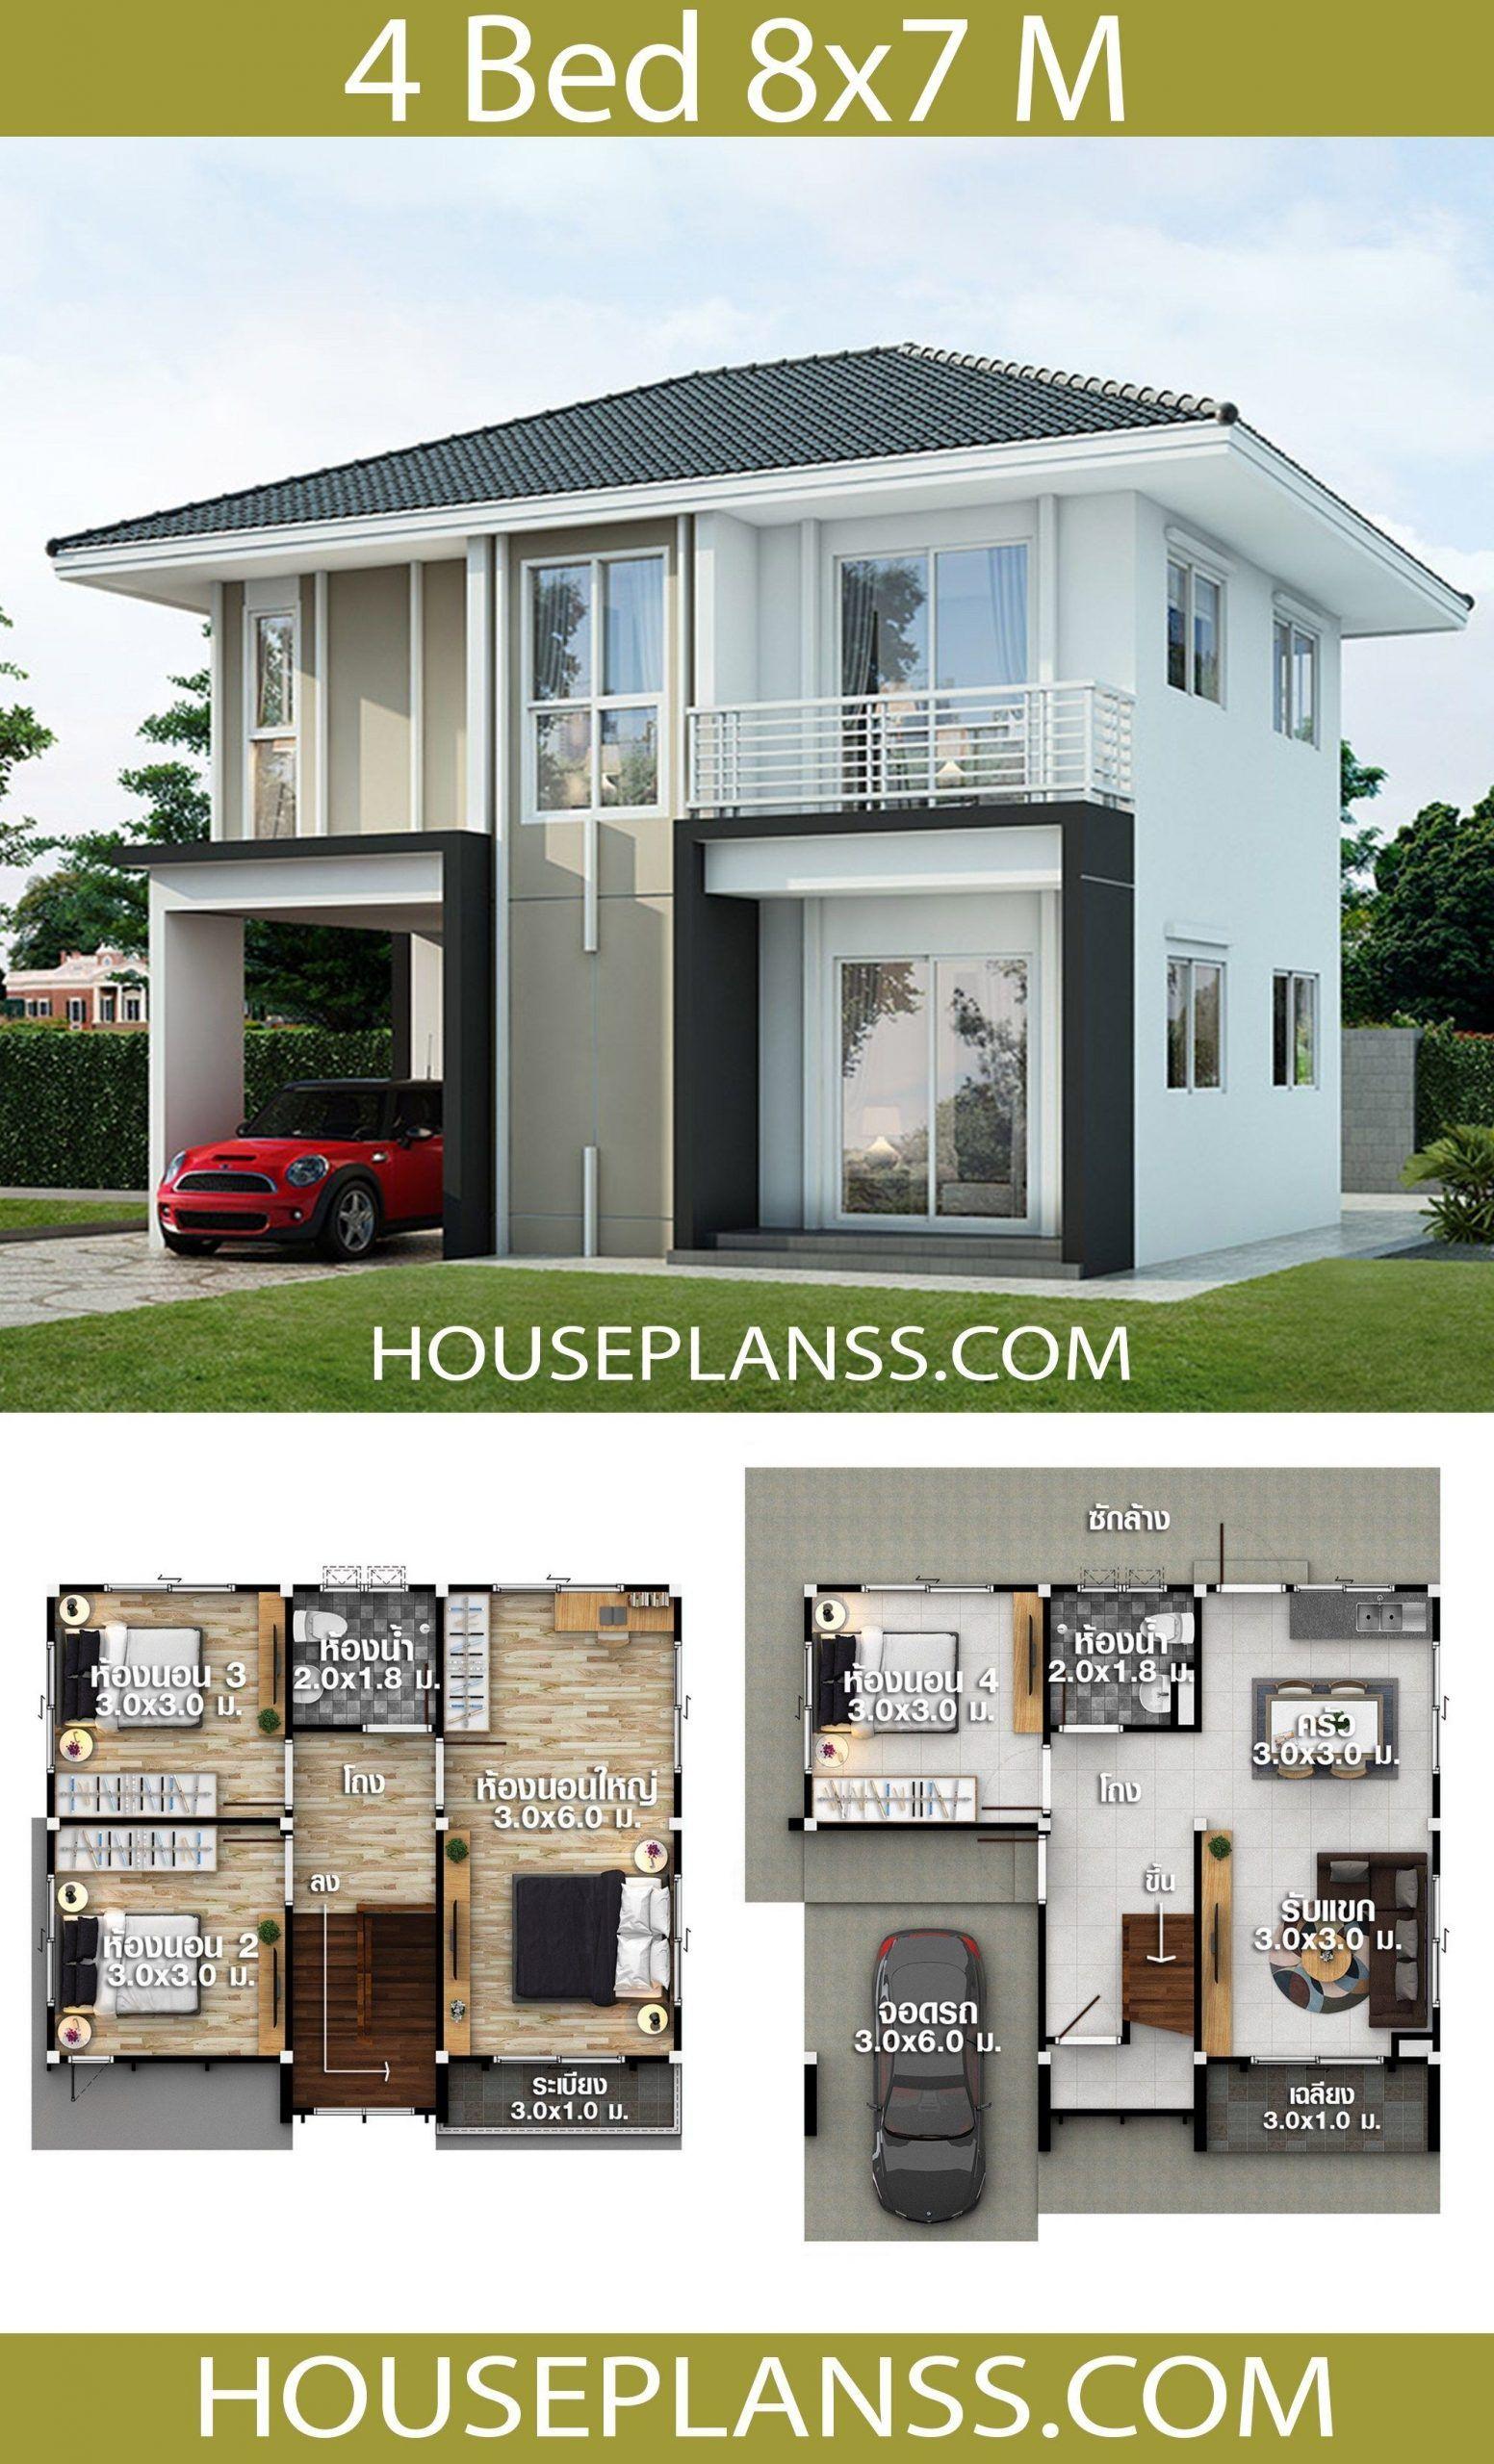 Haus Design Plane Idee 8x7 Mit 4 Schlafzimmer Home Ideas 8x7 Design Haus Home Ide In 2020 House Construction Plan House Architecture Design 2 Storey House Design